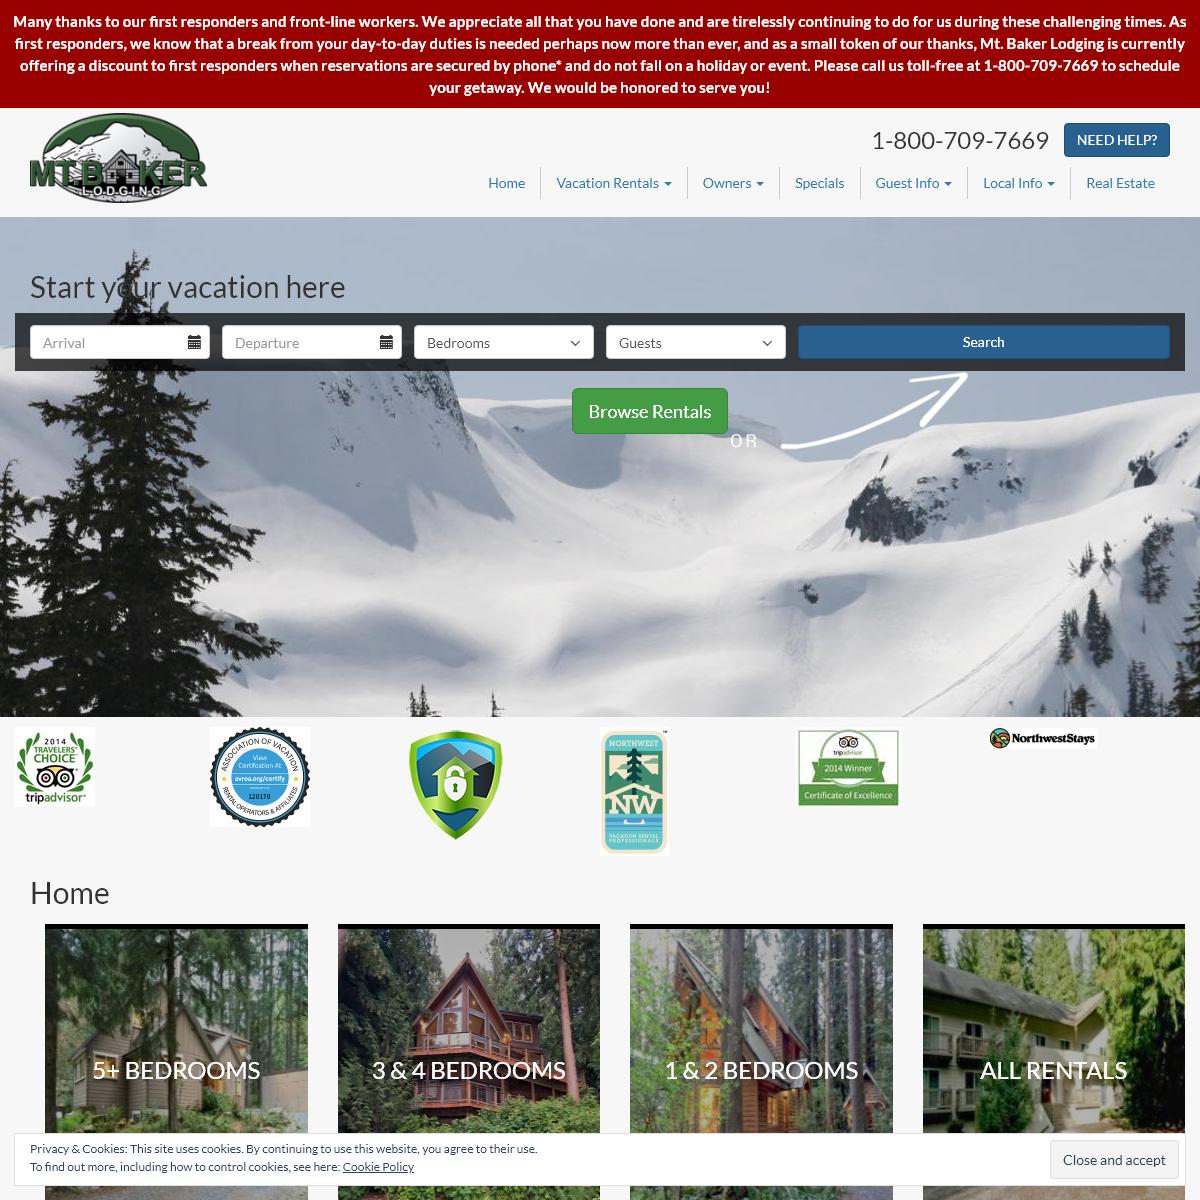 Mt. Baker Lodging, Inc. – Your Gateway to Mt. Baker